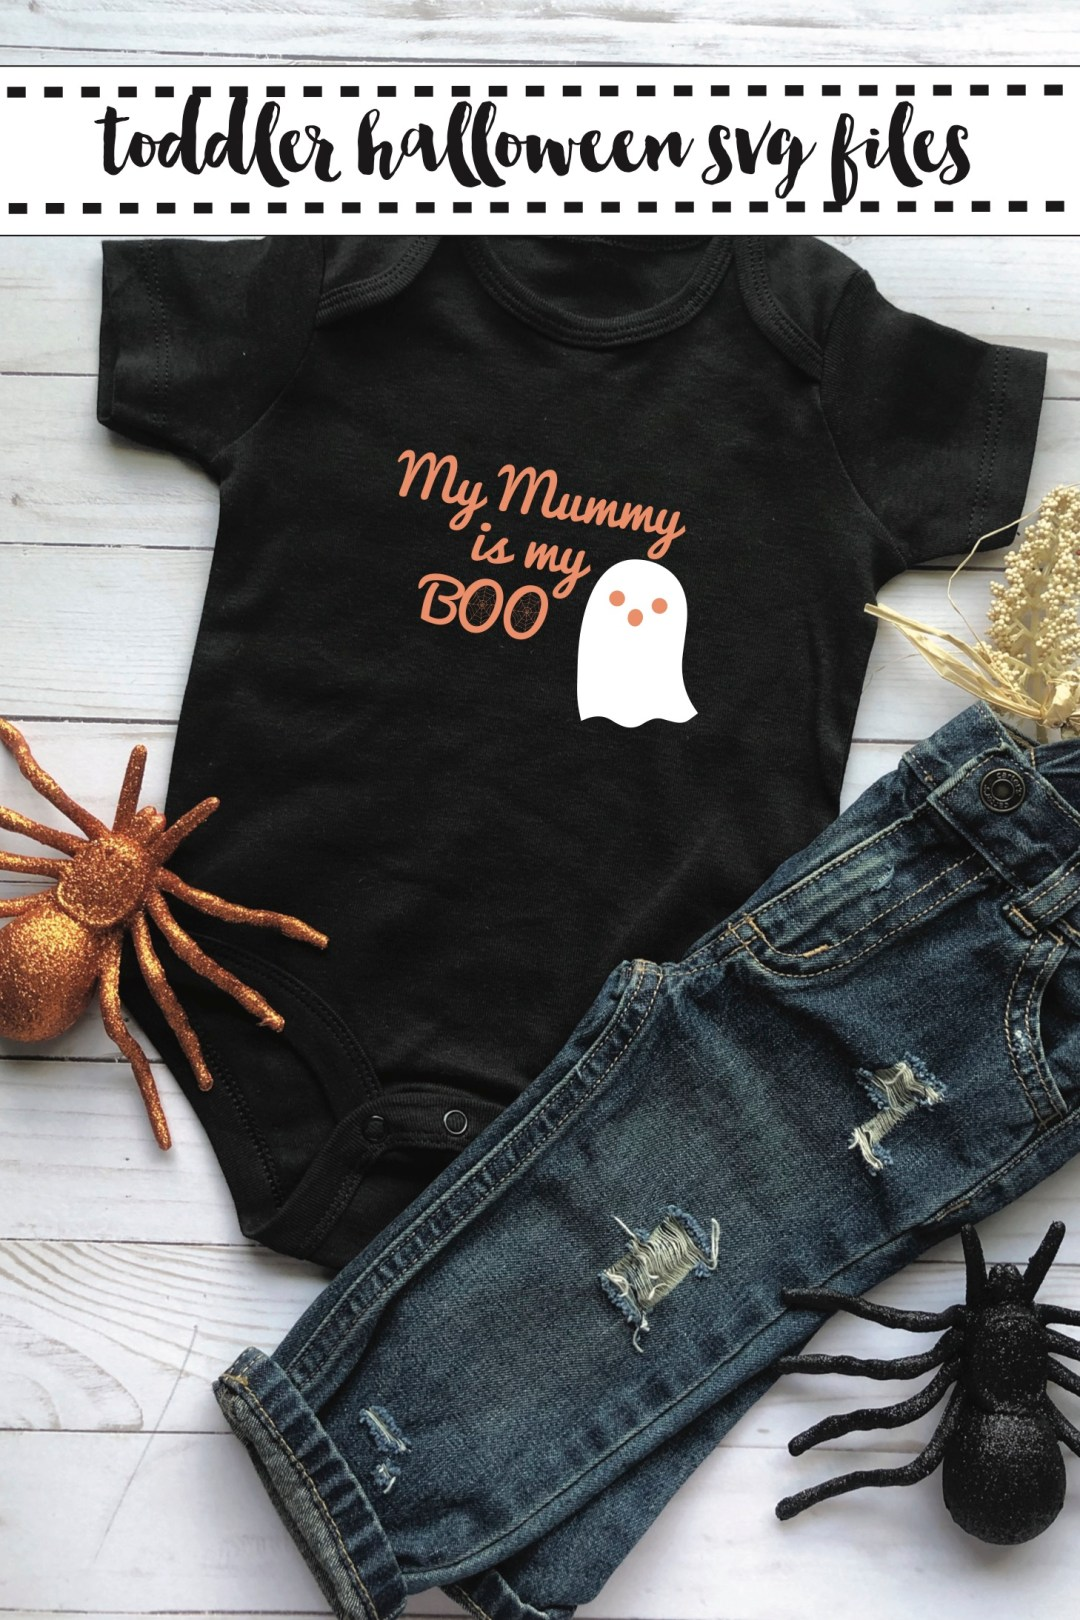 Toddler Halloween Shirts